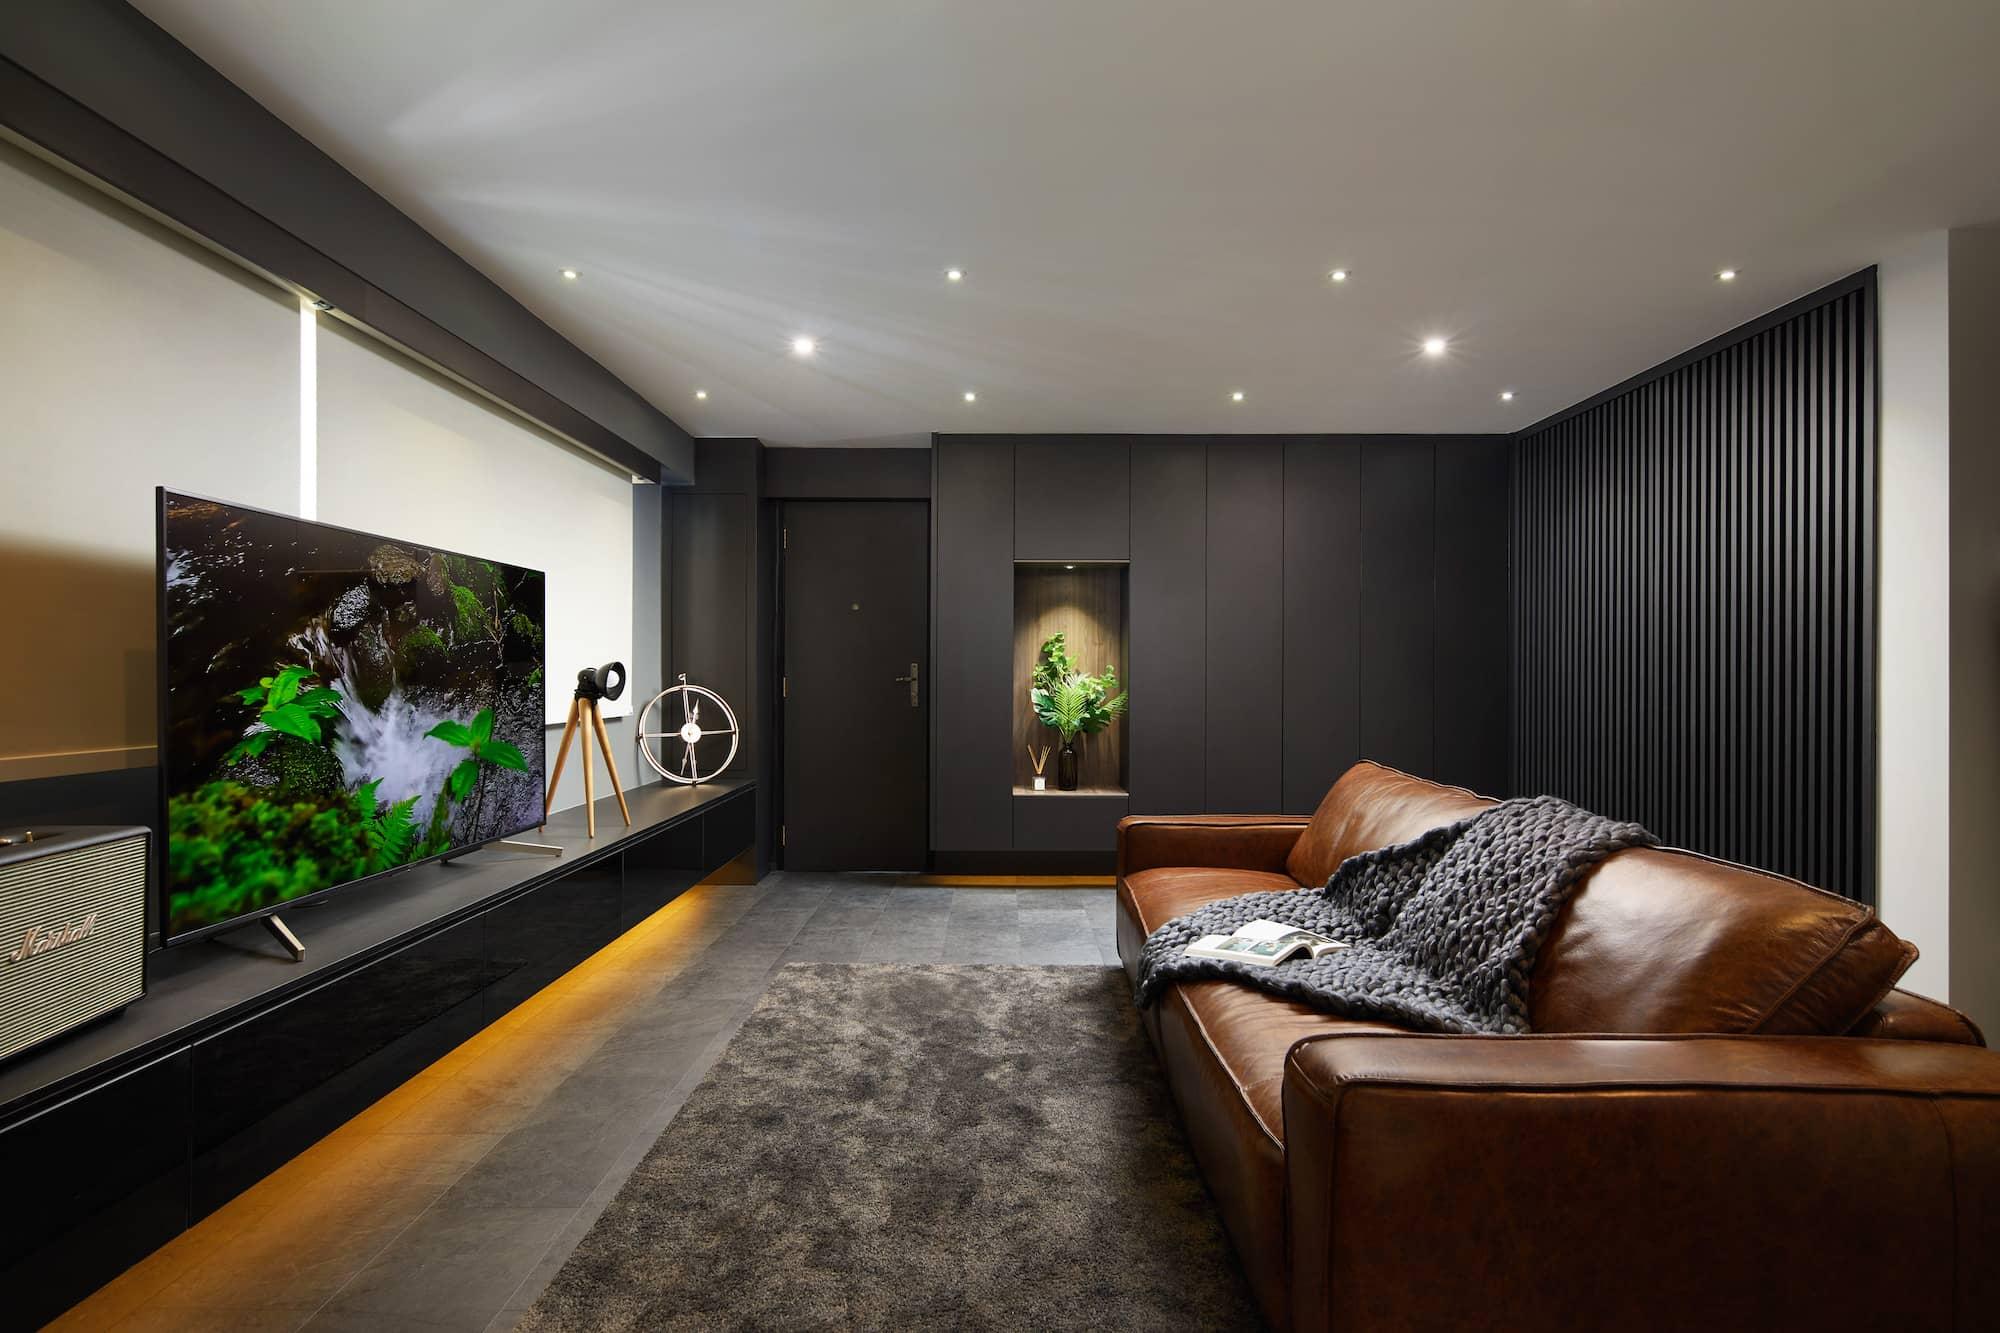 The Most Effective Method To Make An Interior Design Portfolio